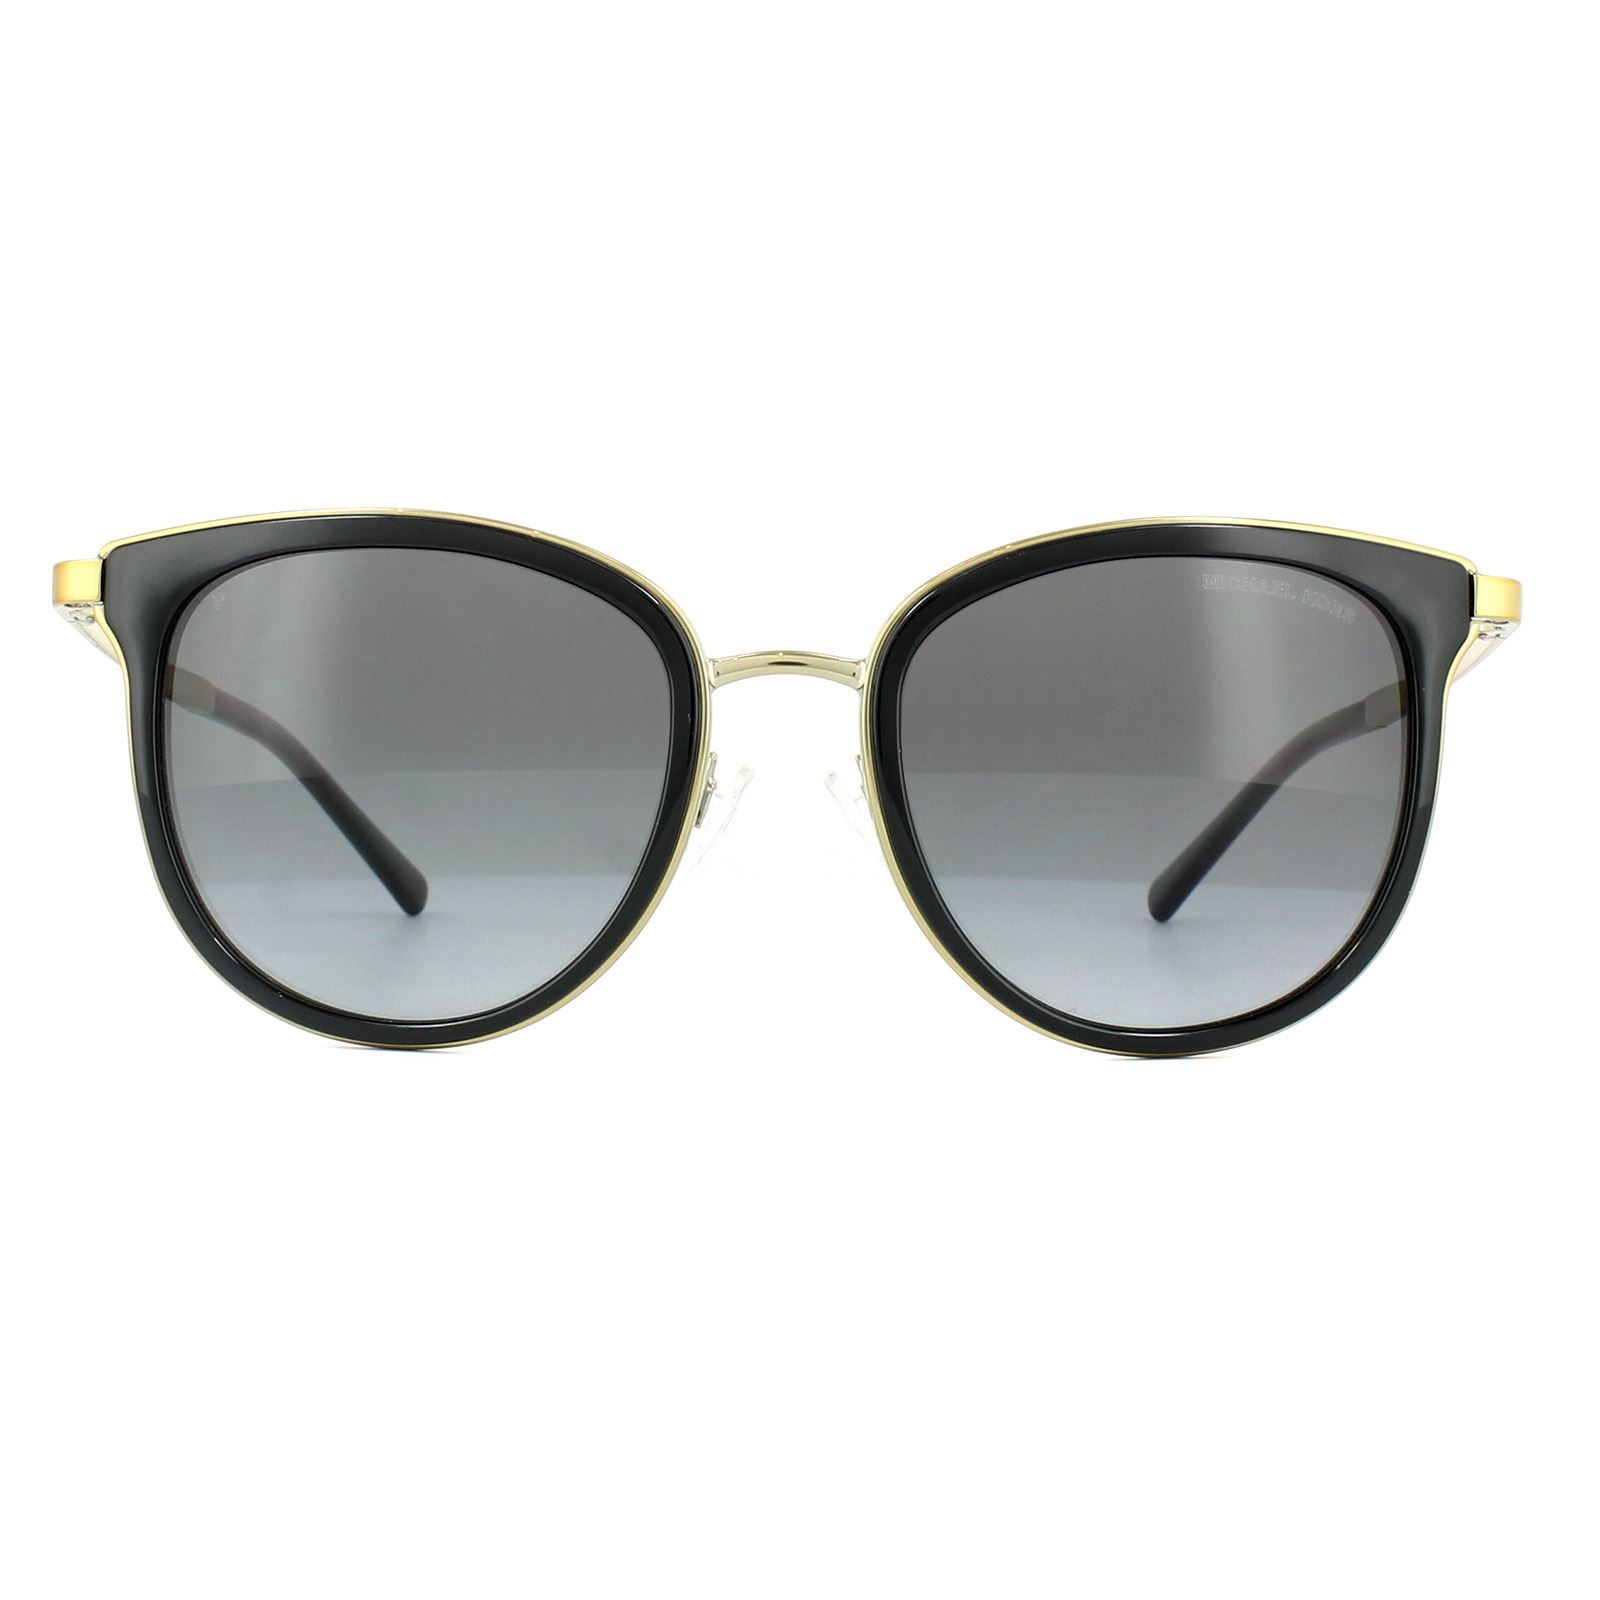 Michael Kors Sunglasses Adrianna 1 1010 1100T3 Black Gold Grey Gradient Polarized